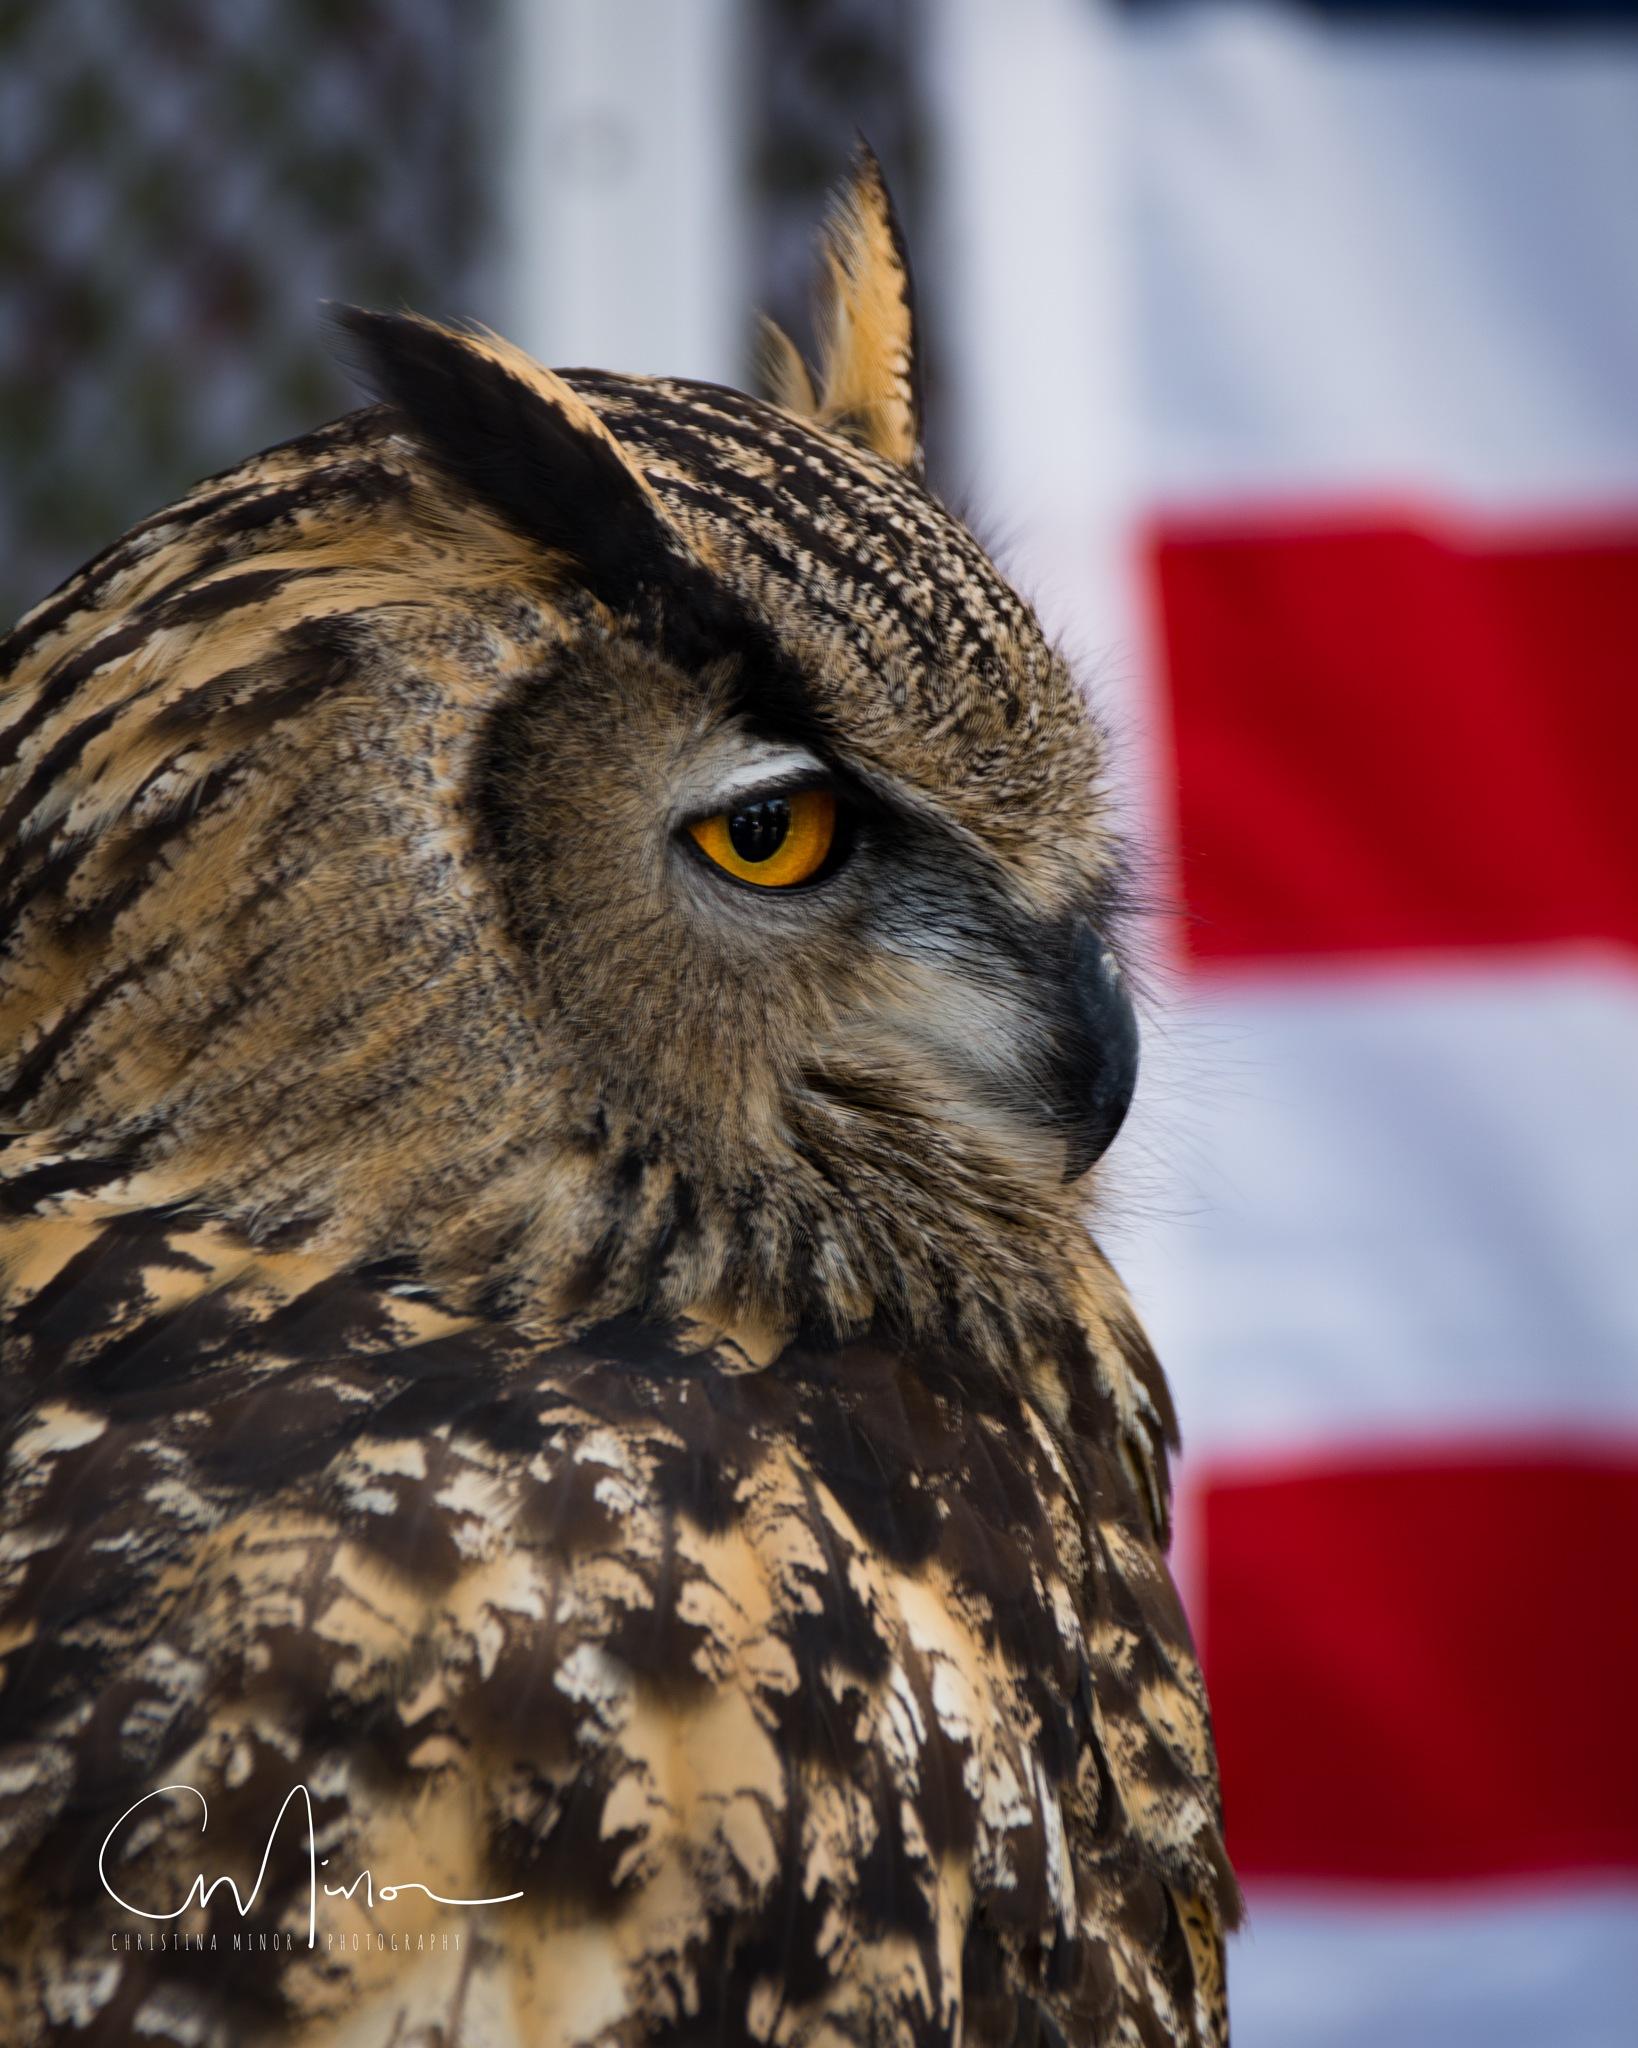 European Horned Owl by Christina Minor